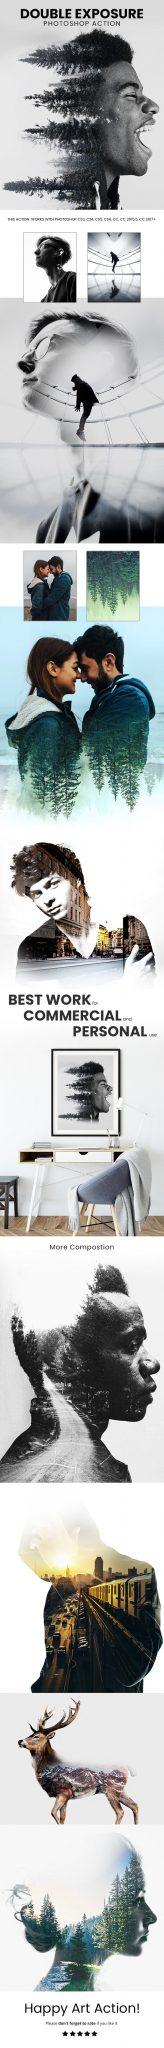 دانلود اکشن فتوشاپ : افکت دابل اکسپوژر Double Exposure Photoshop Action